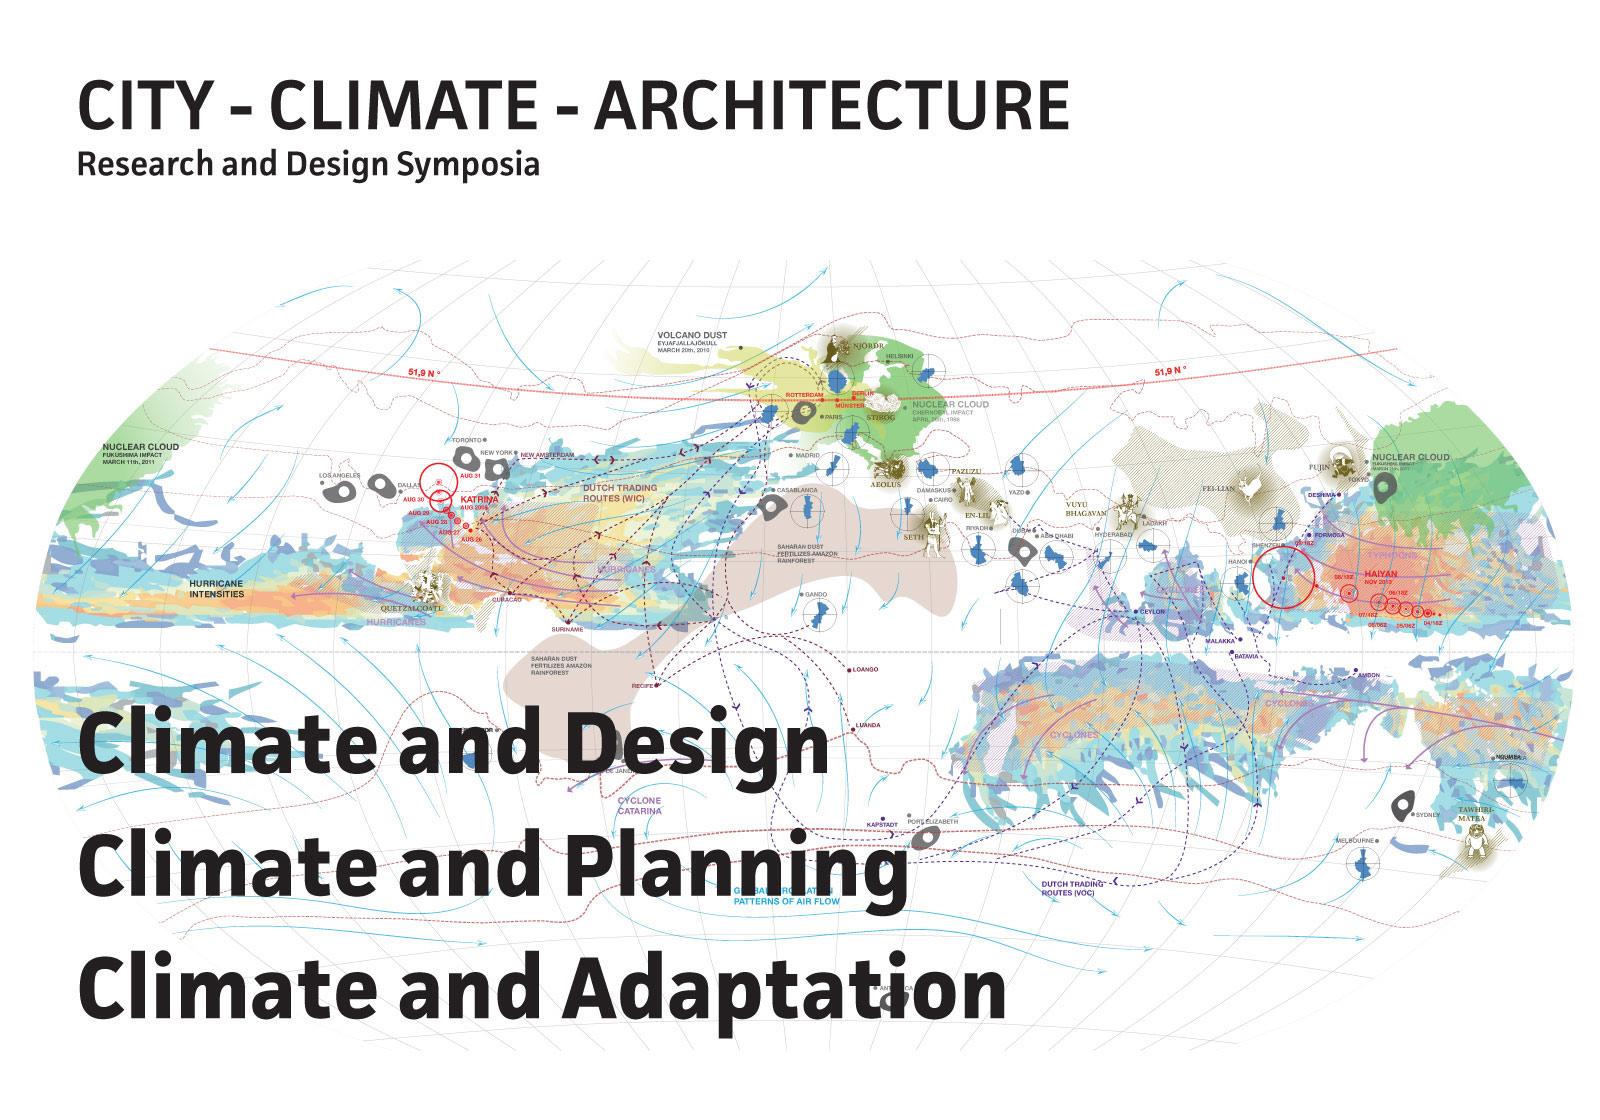 Symposienreihe-City-Climate-Architecture